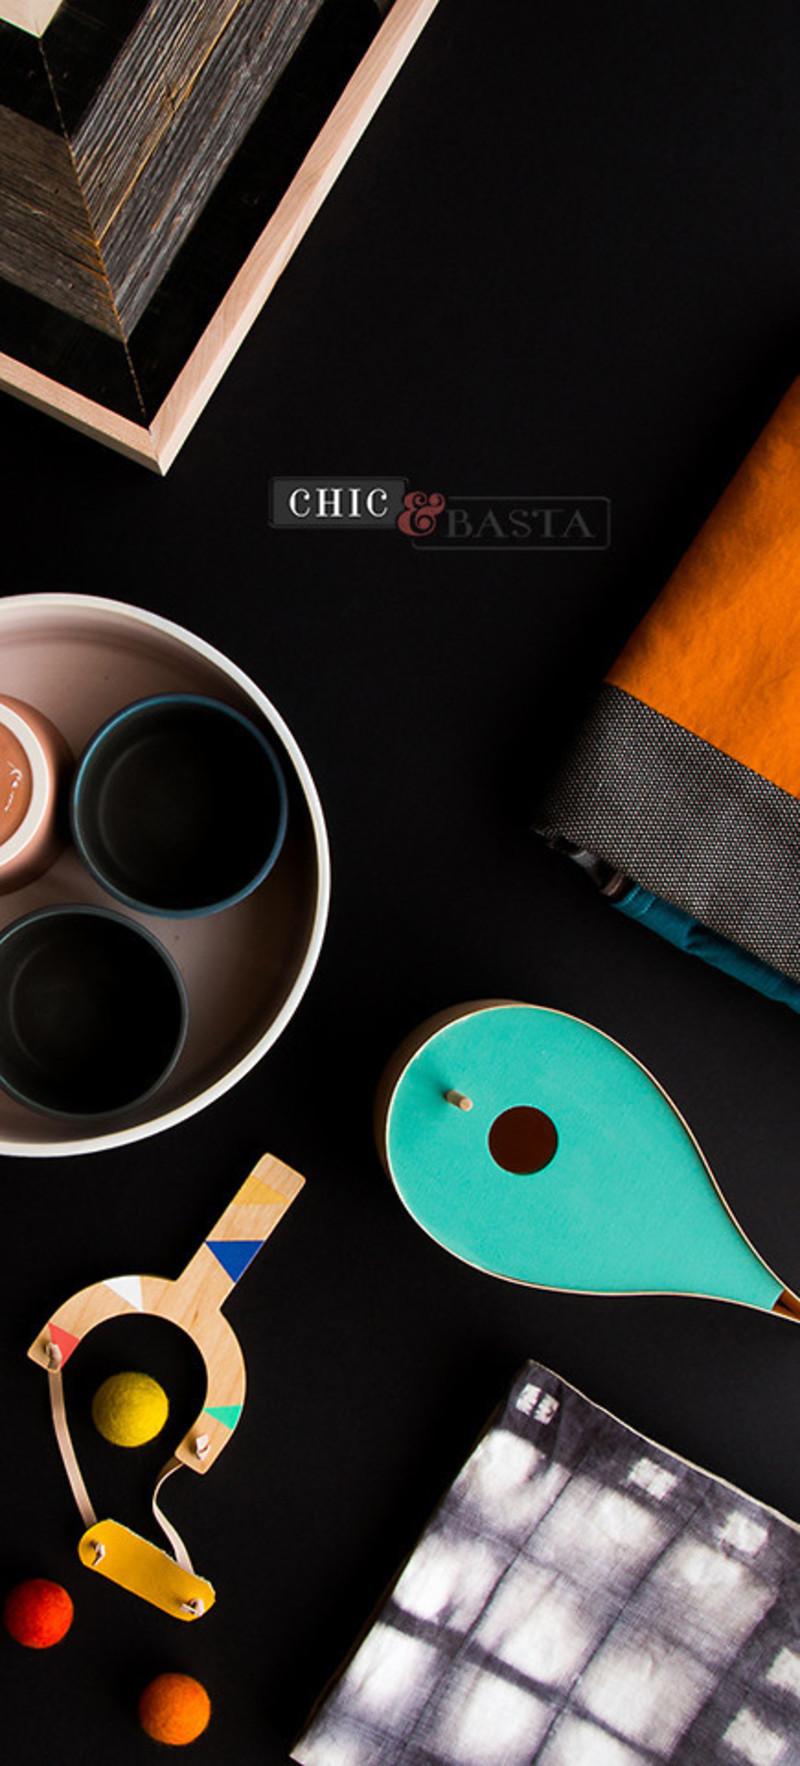 Press kit - Press release - C'est Chic! Designed in Quebec - Chic & Basta